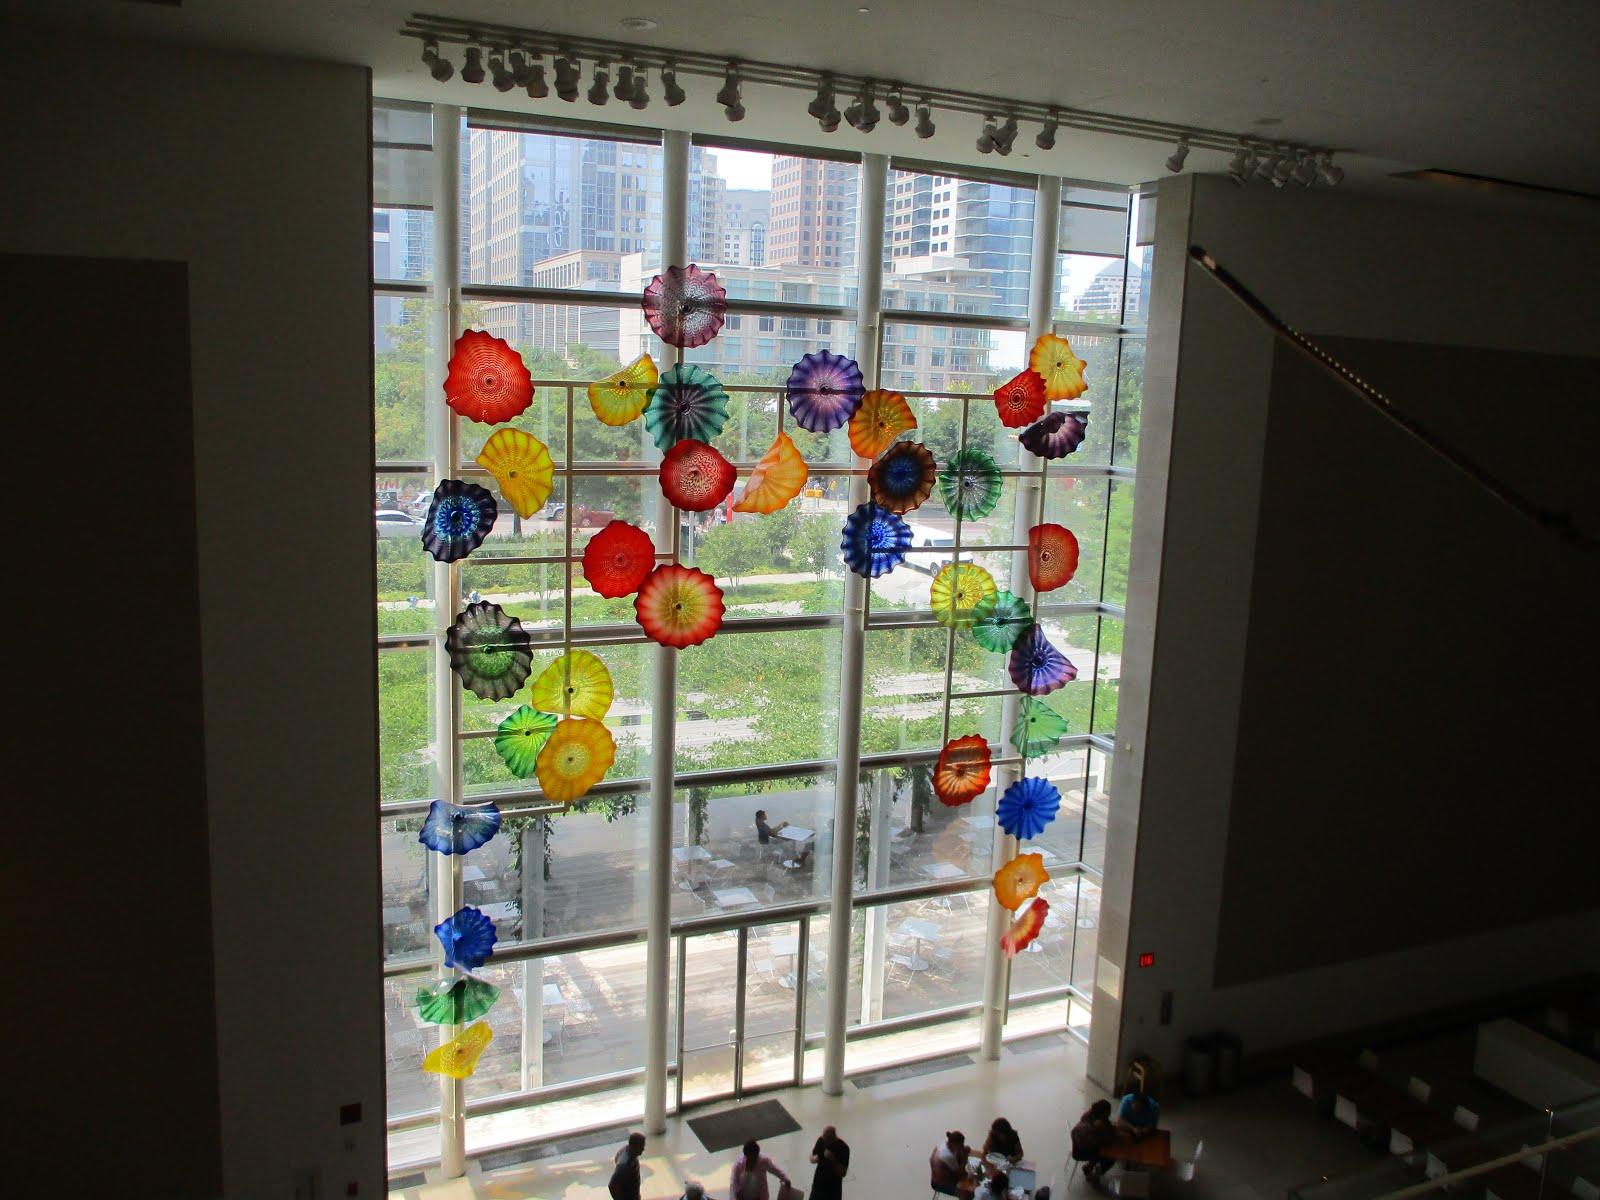 DALLAS MUSEUM OF ART - TEXAS